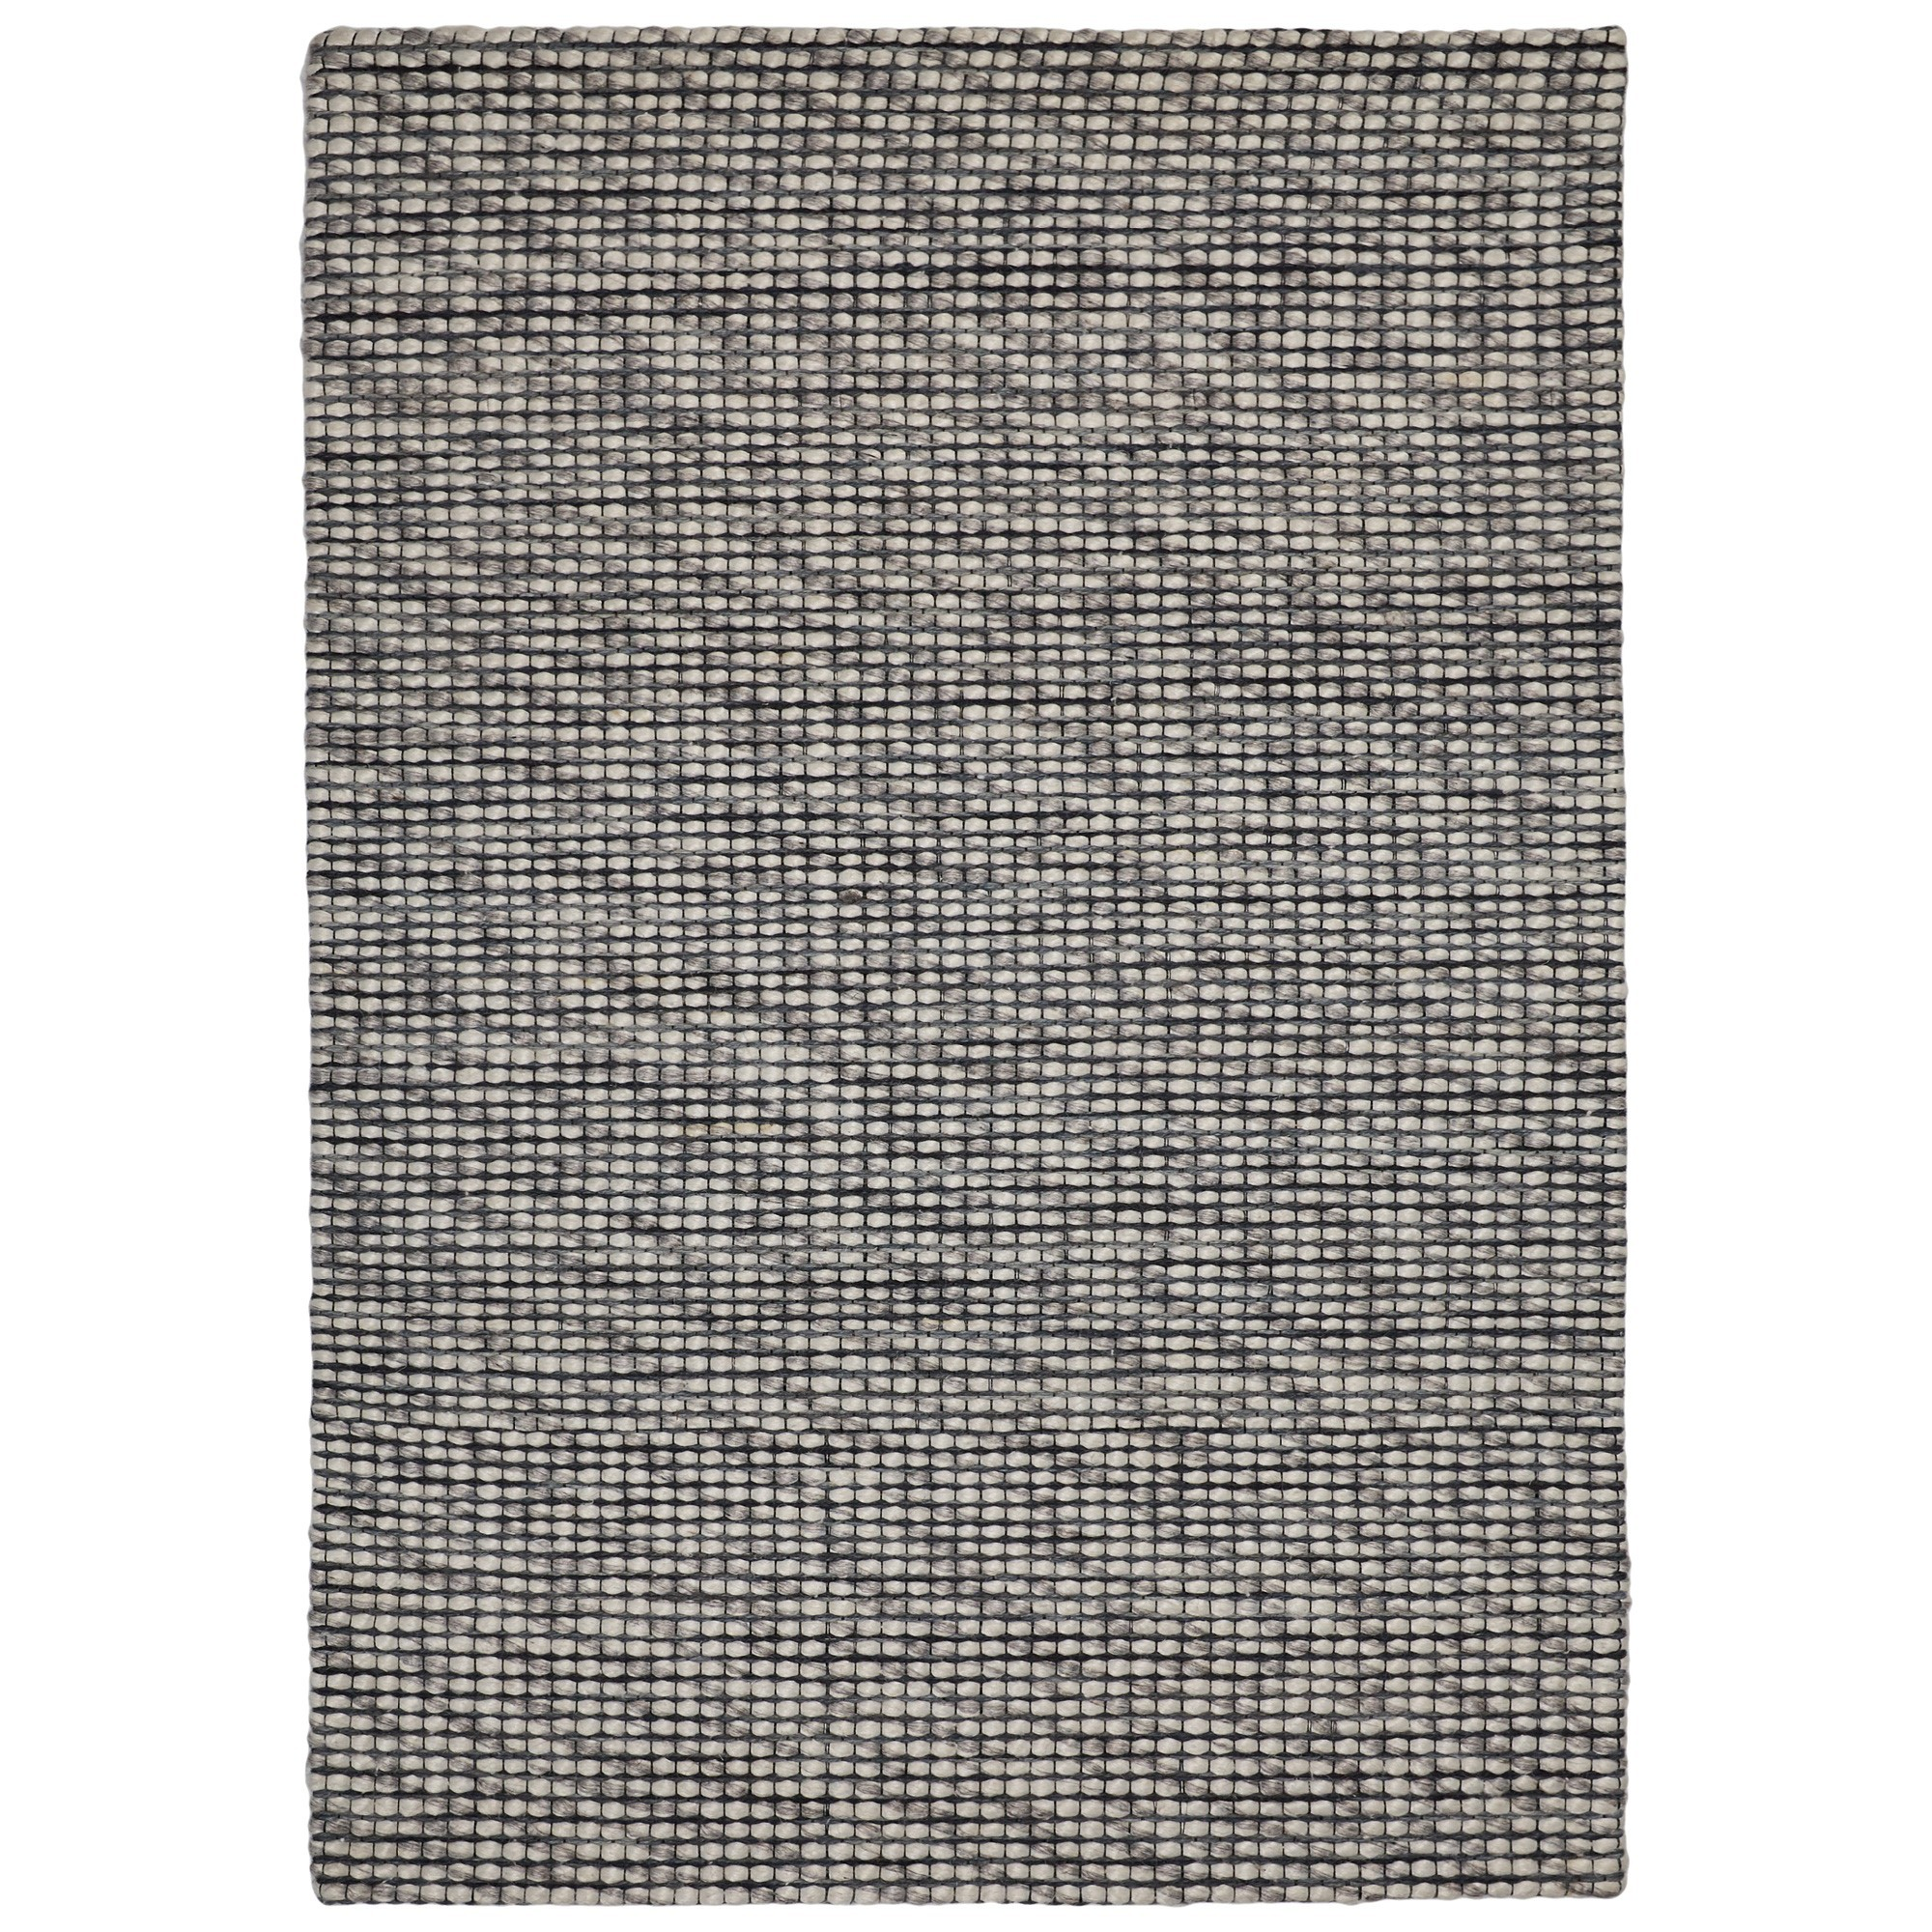 Mist Handwoven Wool Rug, 330x240cm